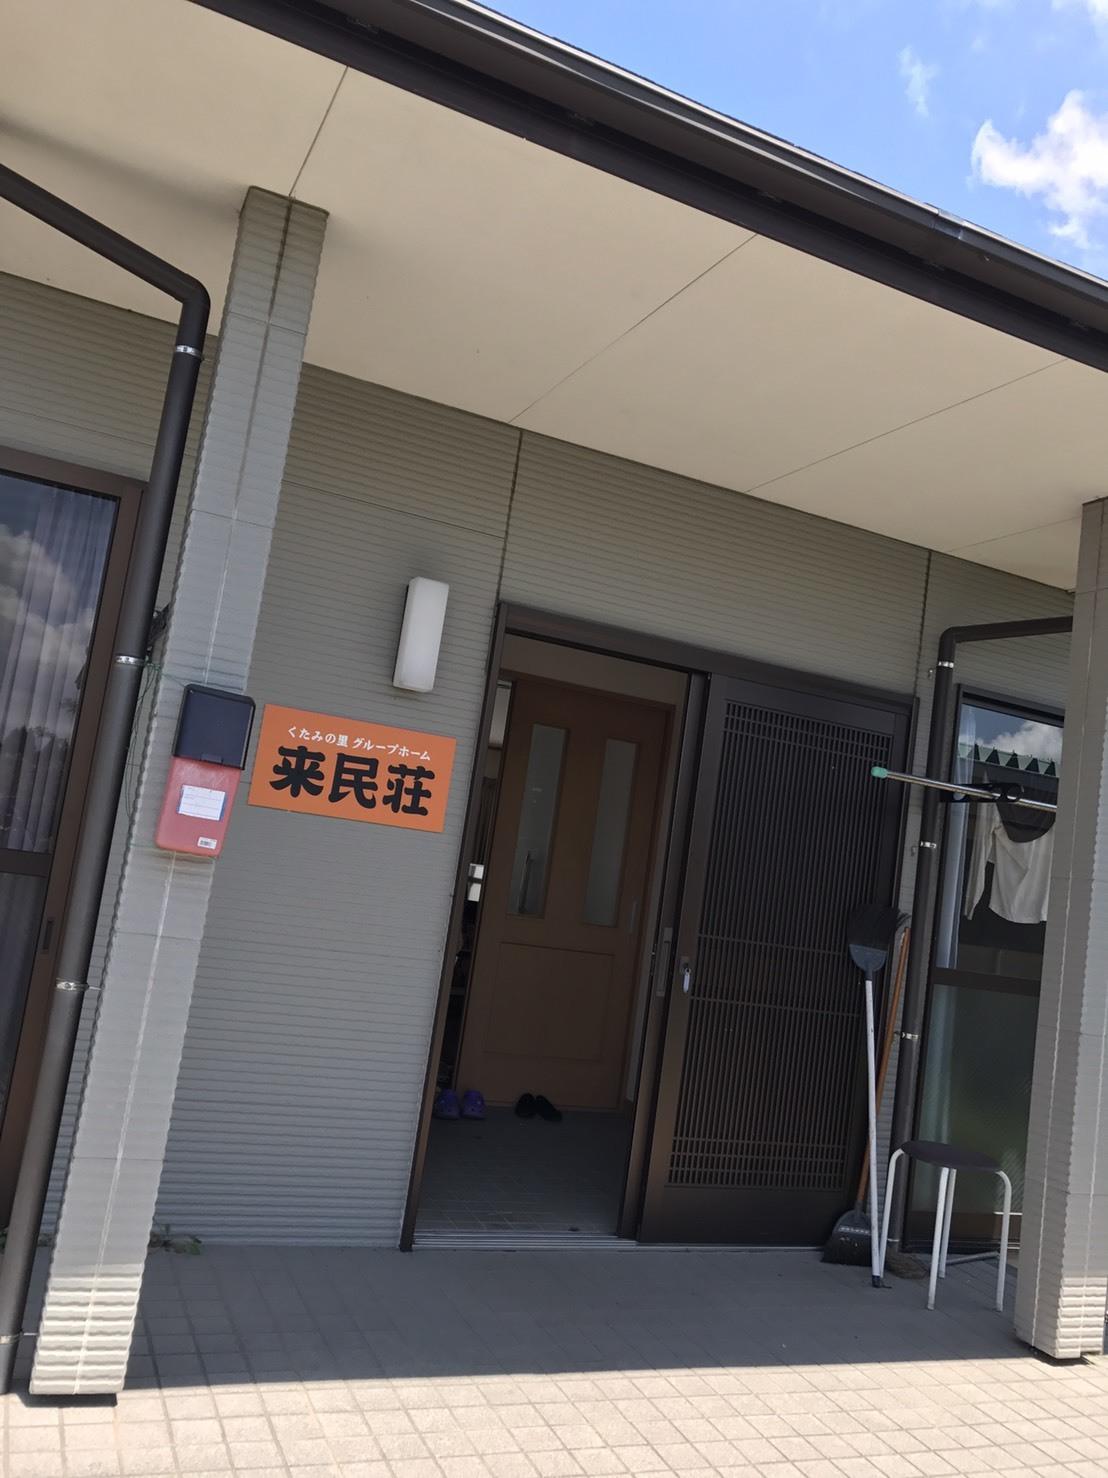 S__6709273.jpg